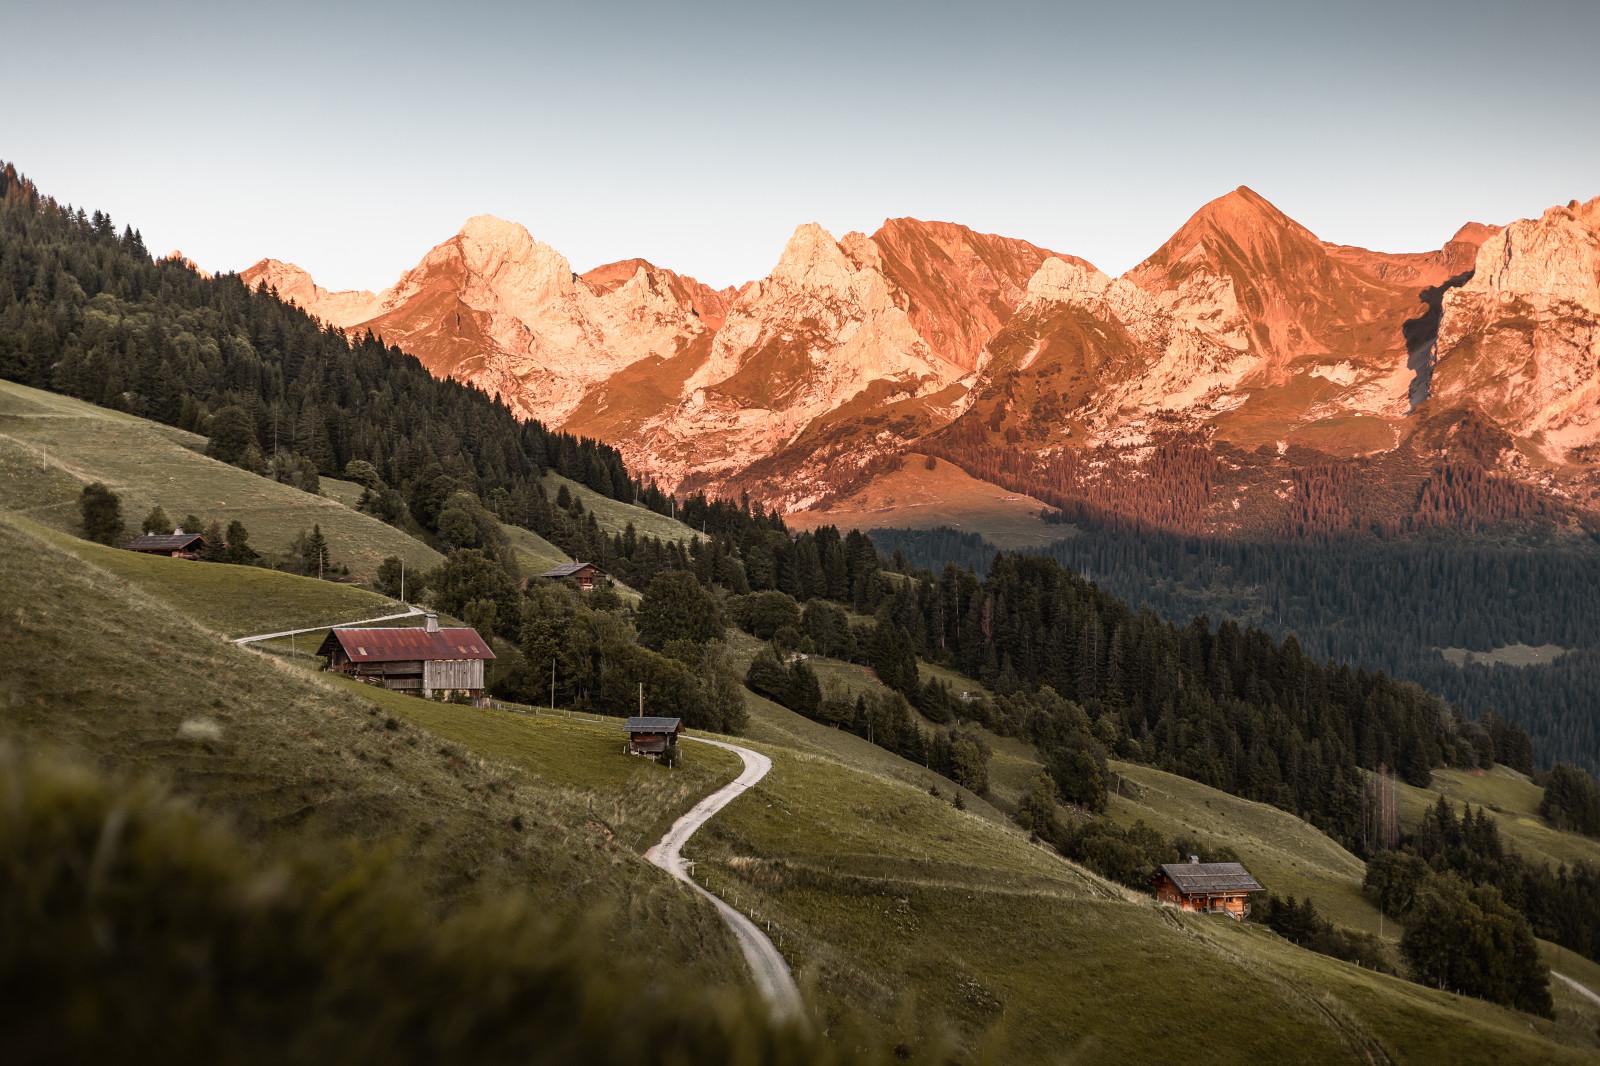 33aravis-chudry-paysage-e19-jpg-1600px-301945